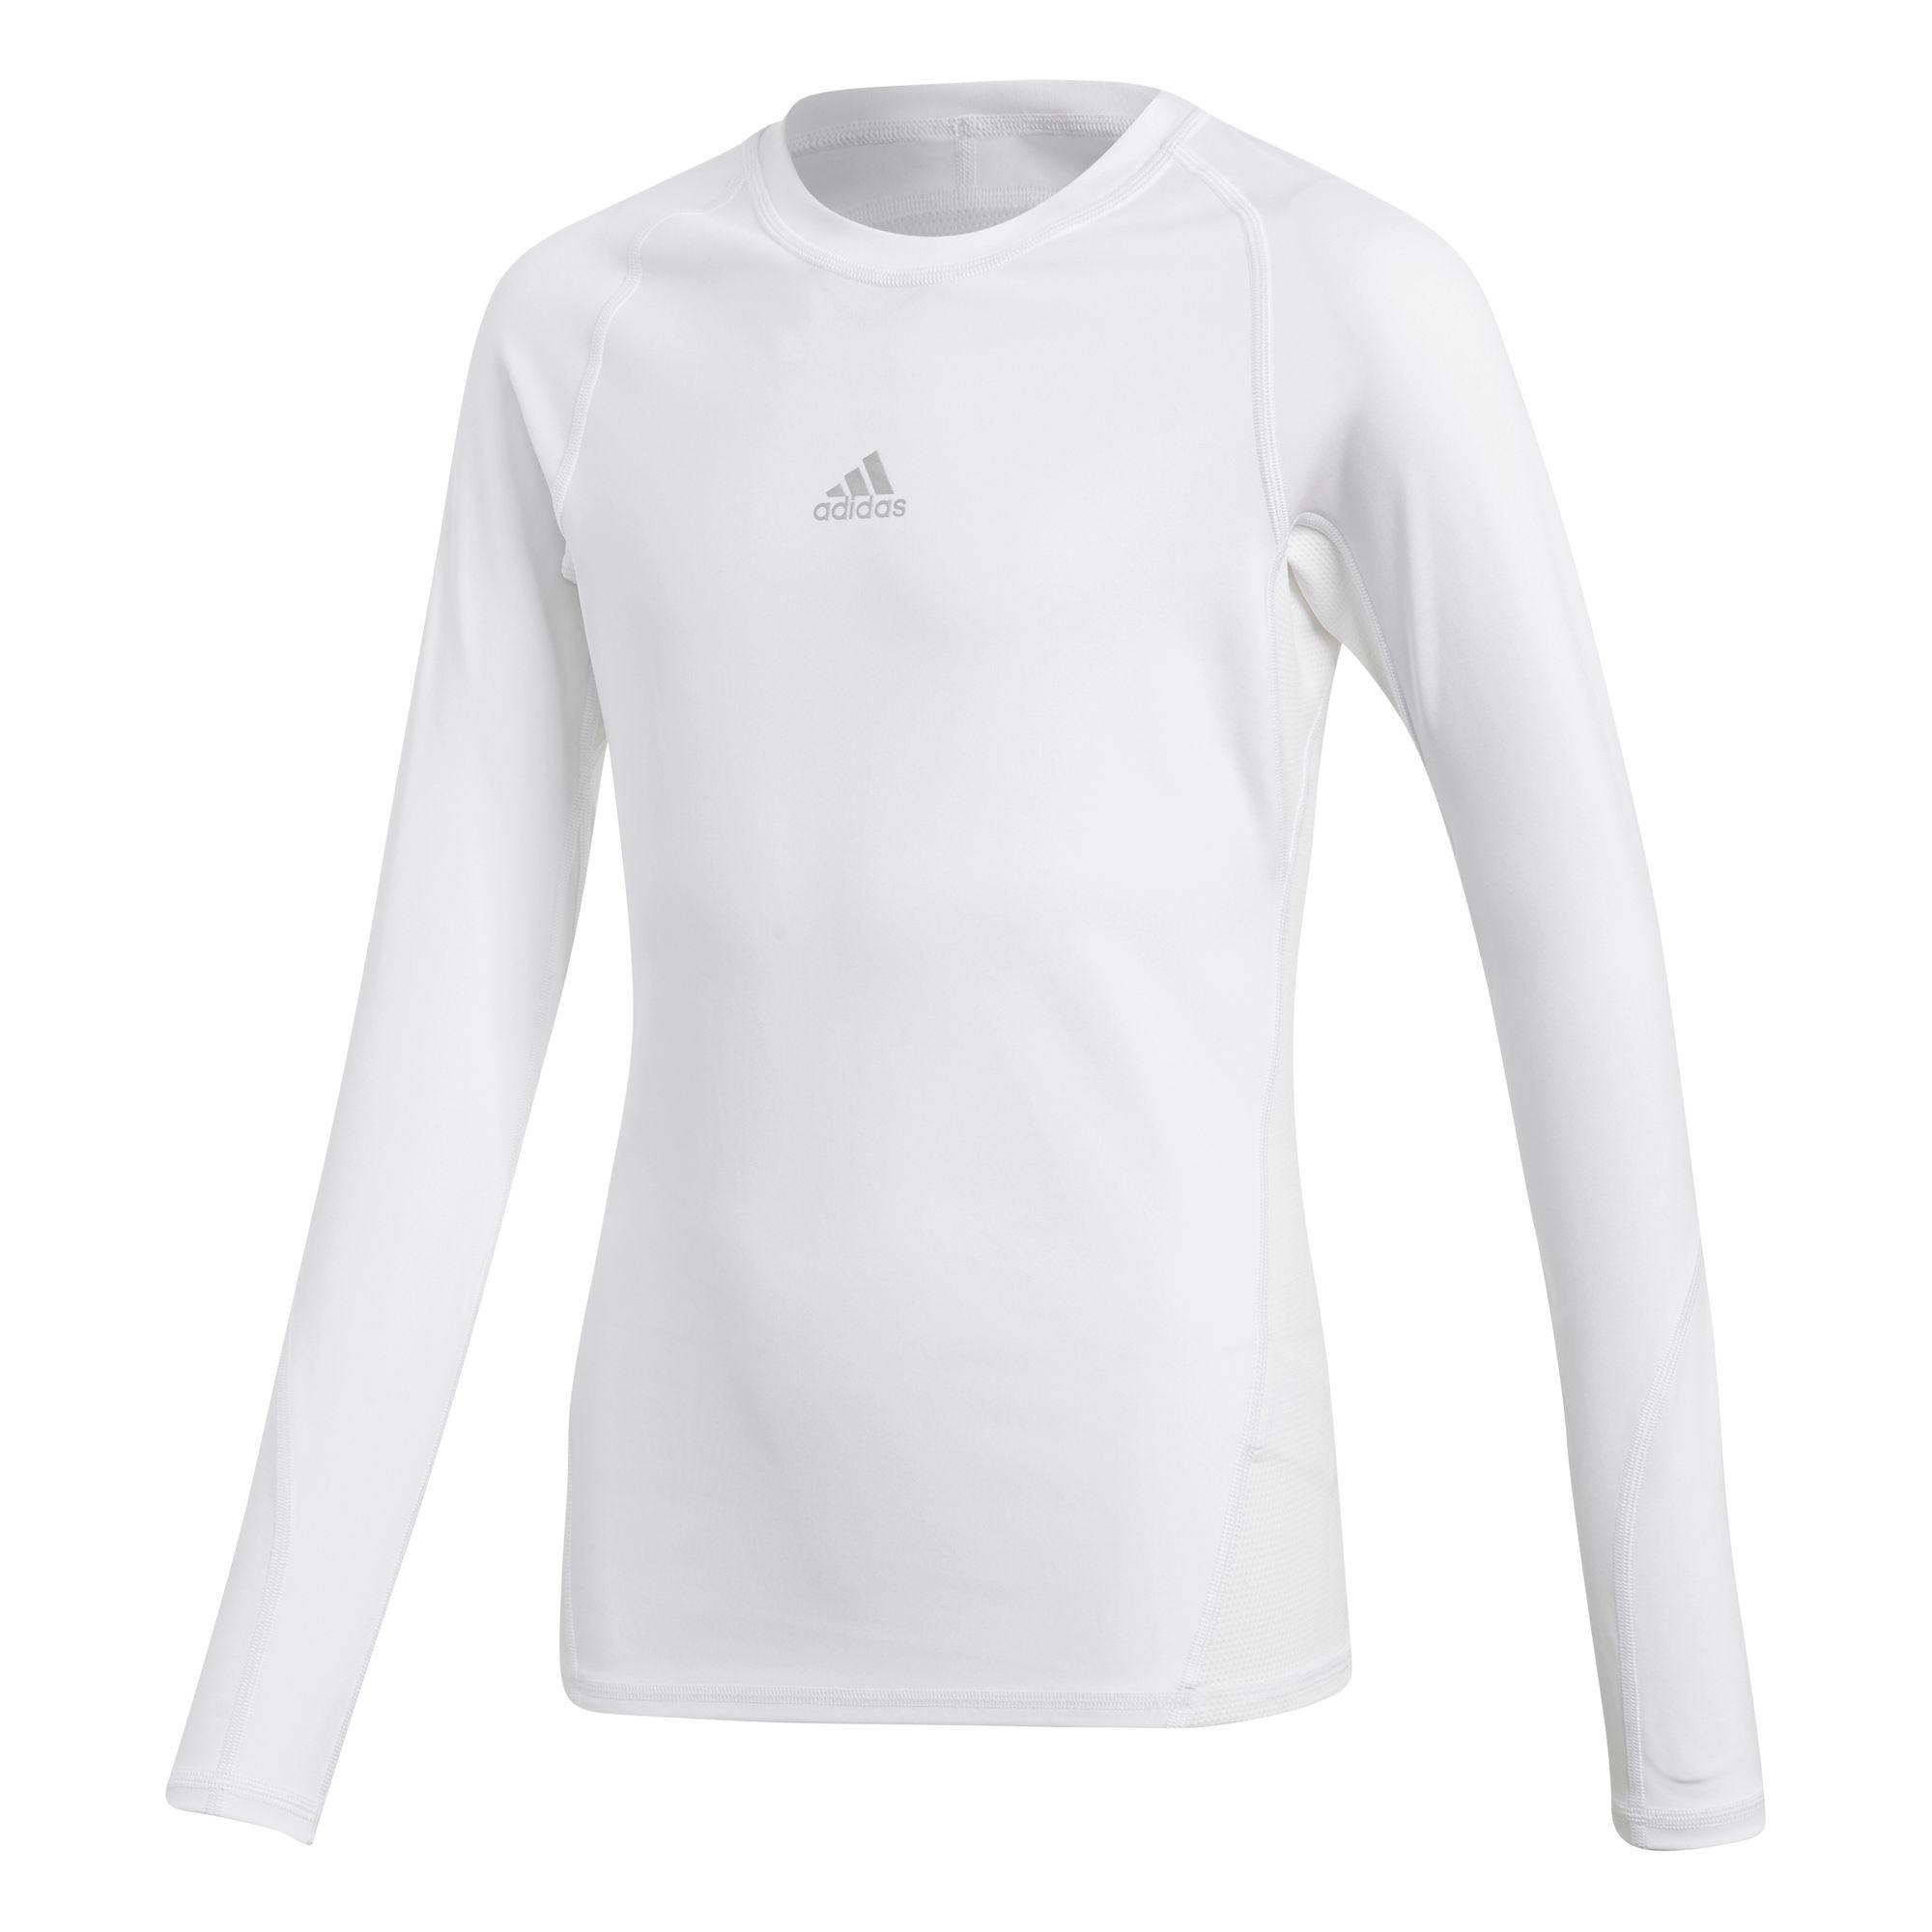 ADIDAS Kinder Football T-Shirt